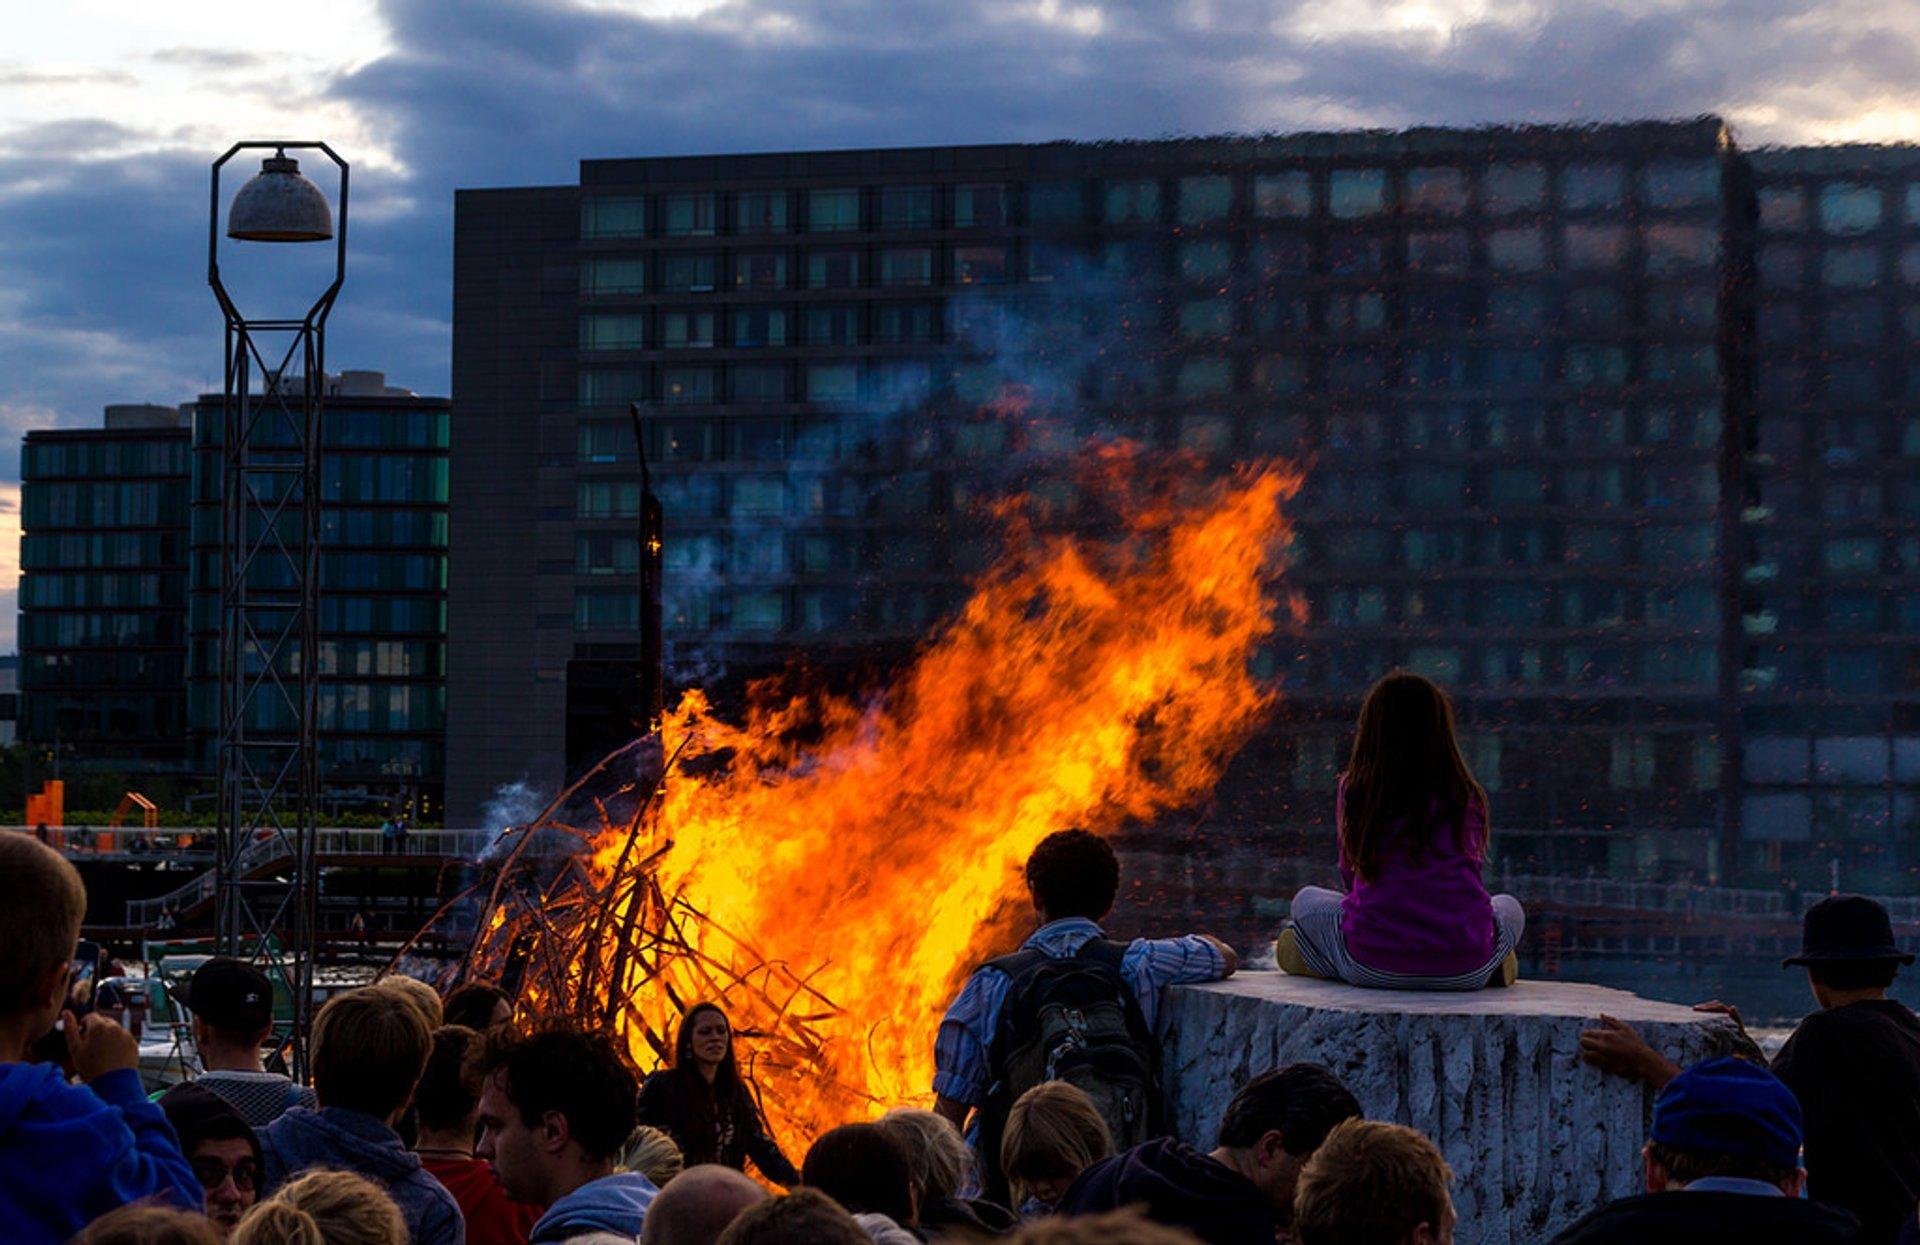 Sankt Hans Aften (Midsummer) in Denmark 2019 - Best Time